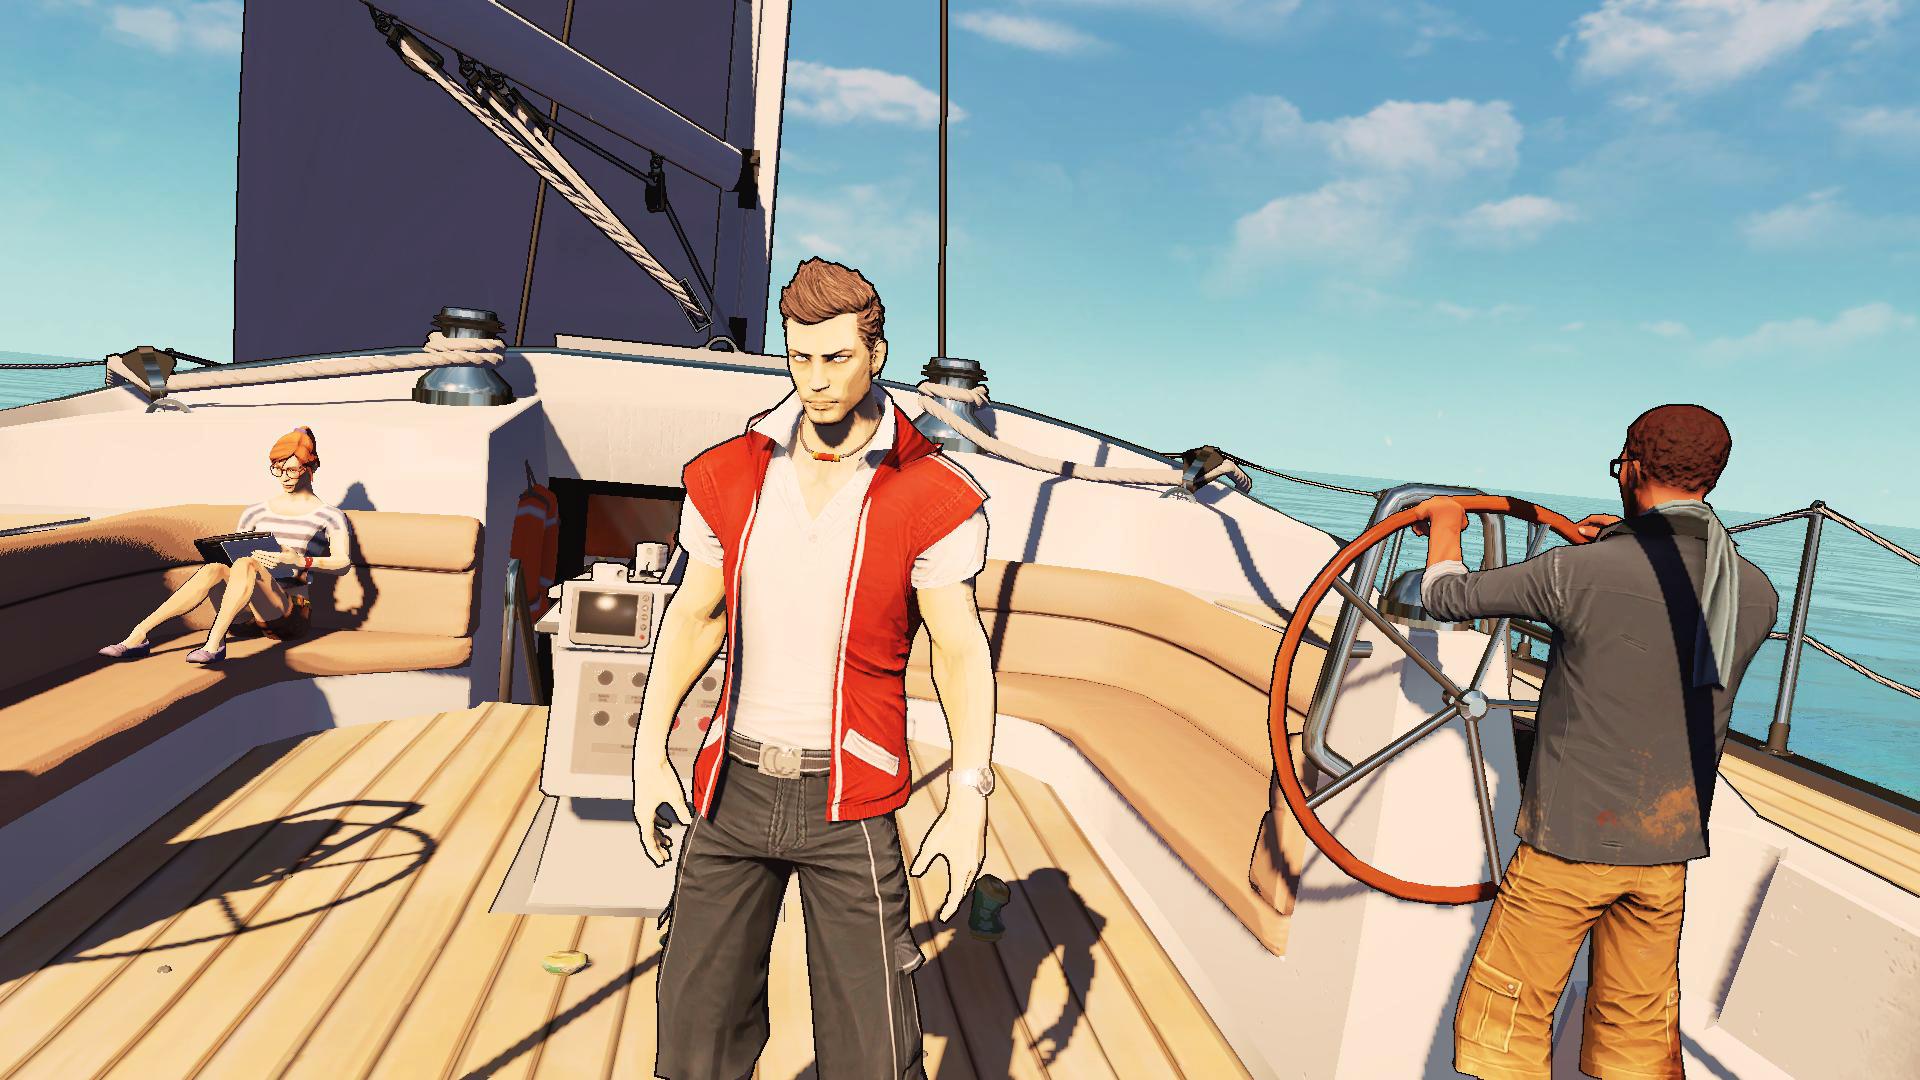 Escape Dead Island é anunciado para X360, PS3 e PC [imagens/vídeo]